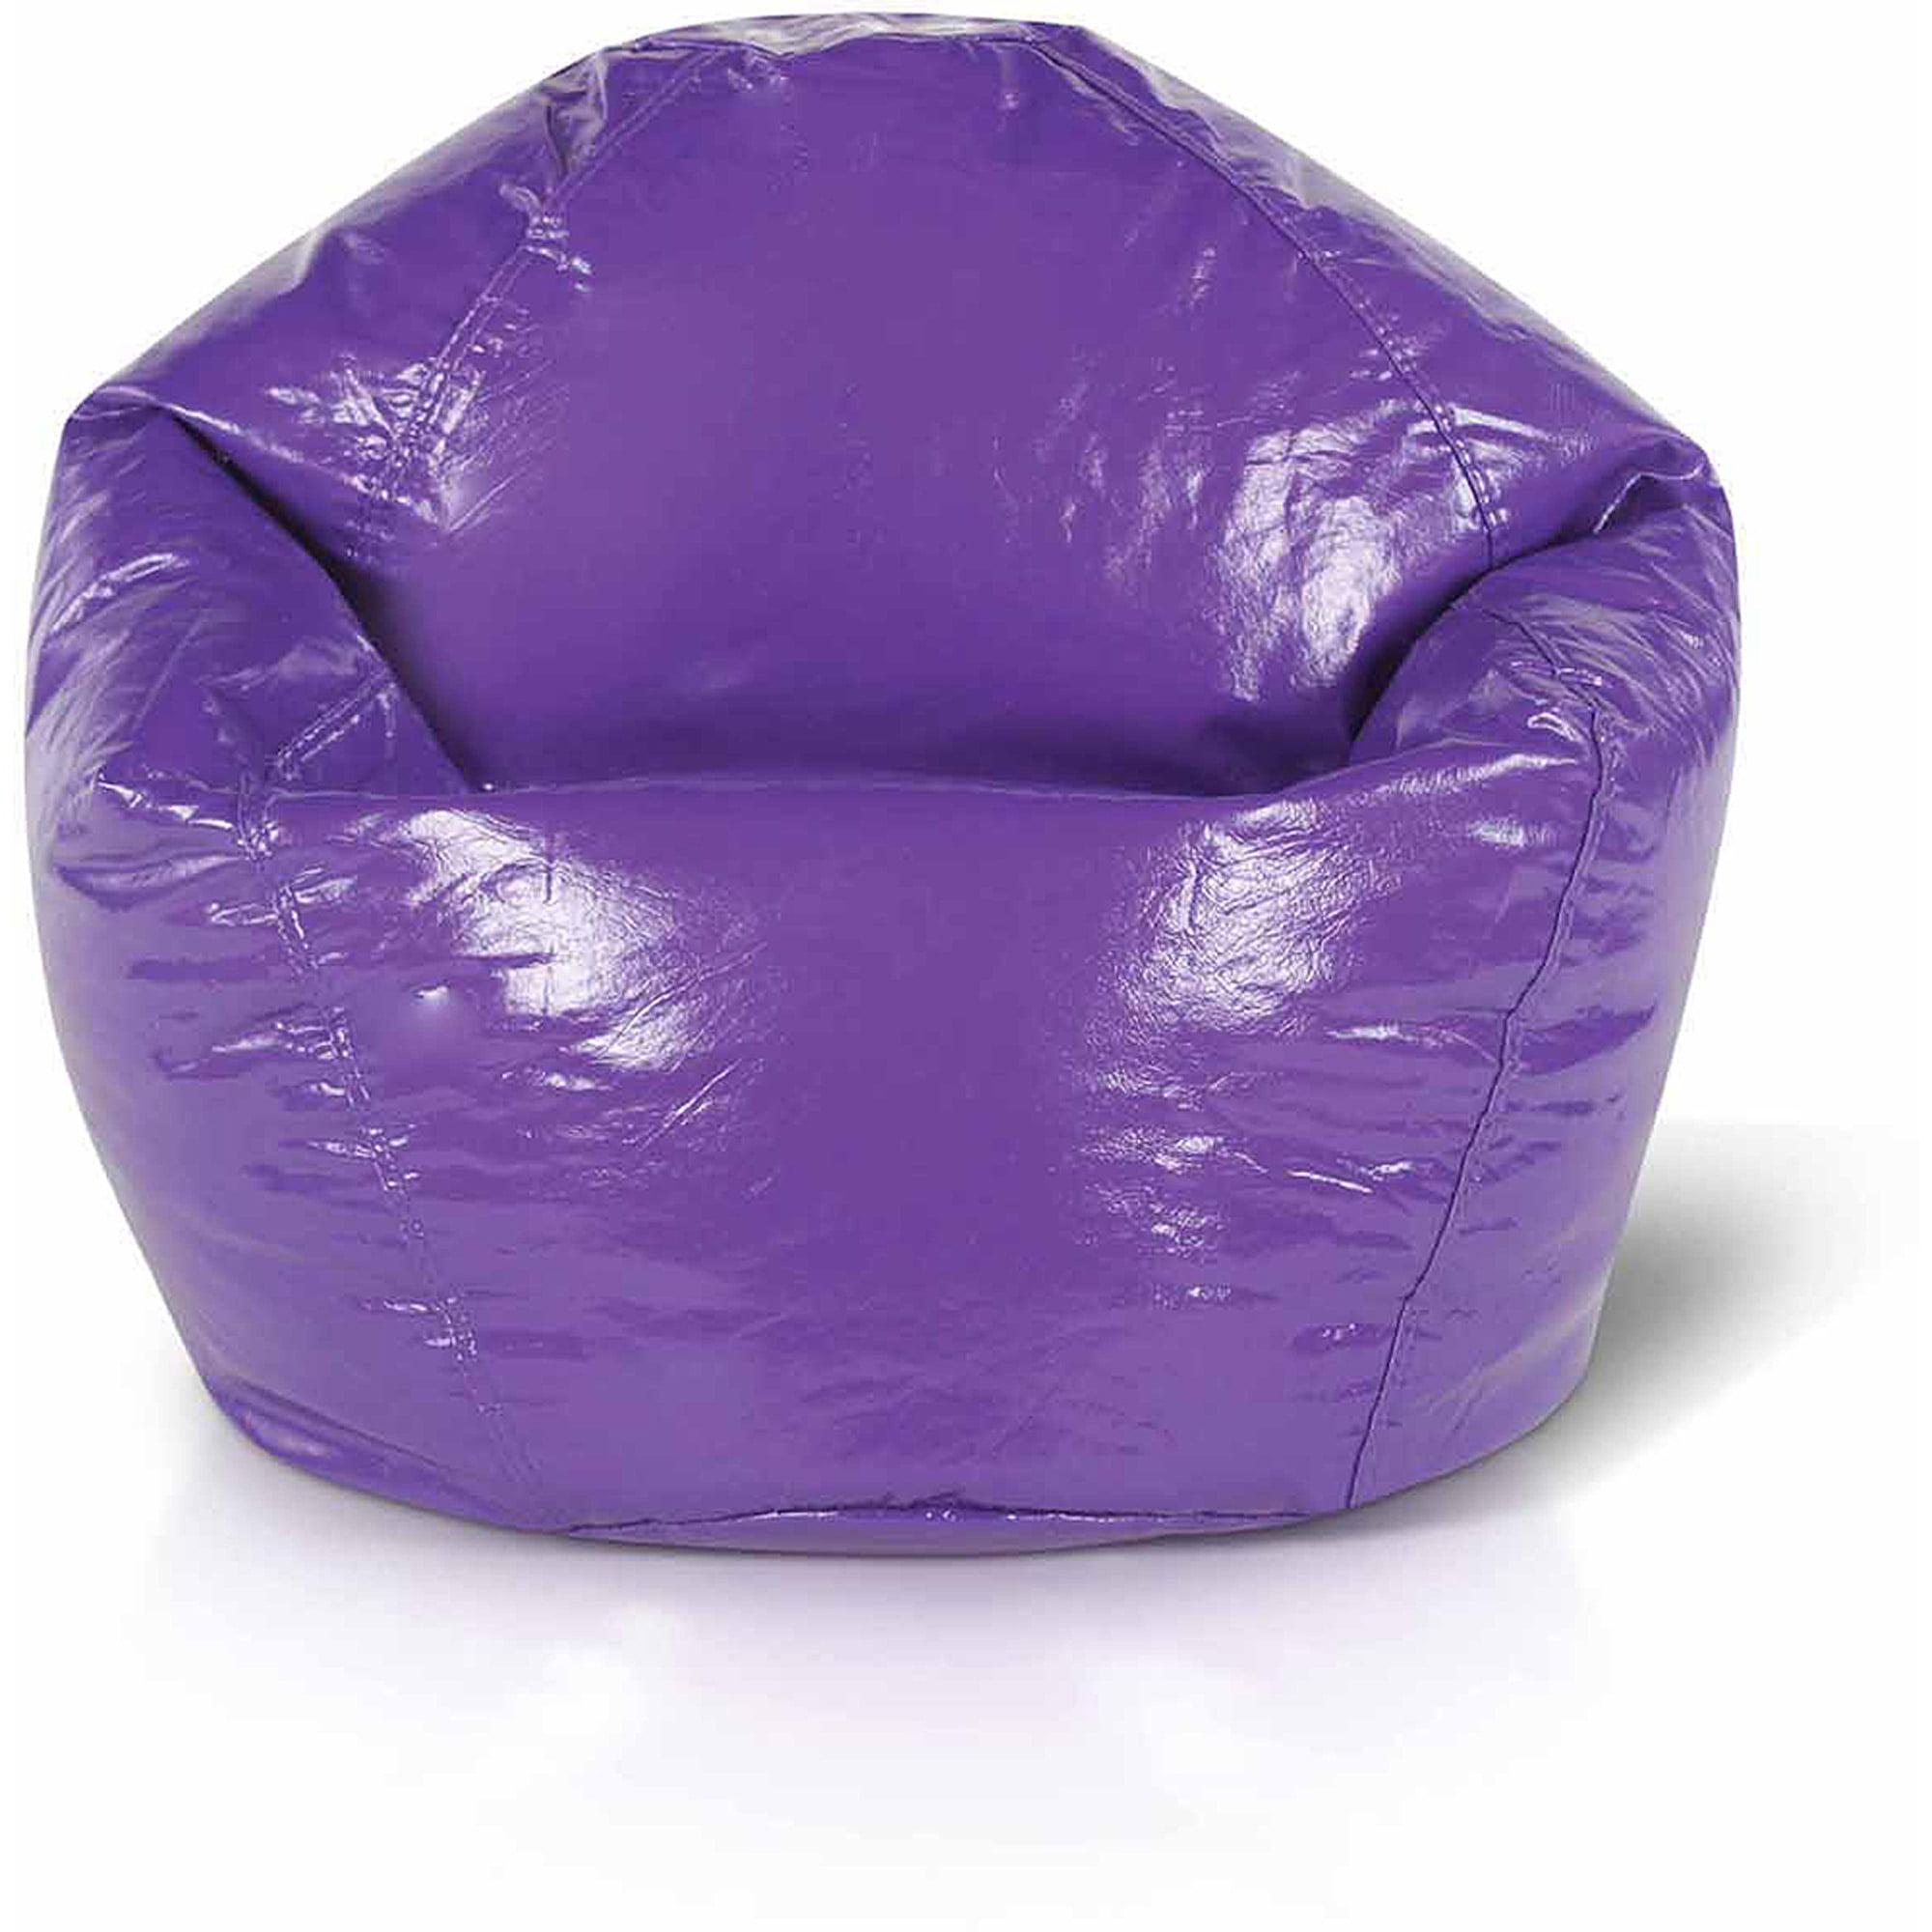 Junior Wetlook Collection Bean Bag Chair, Vinyl Grape